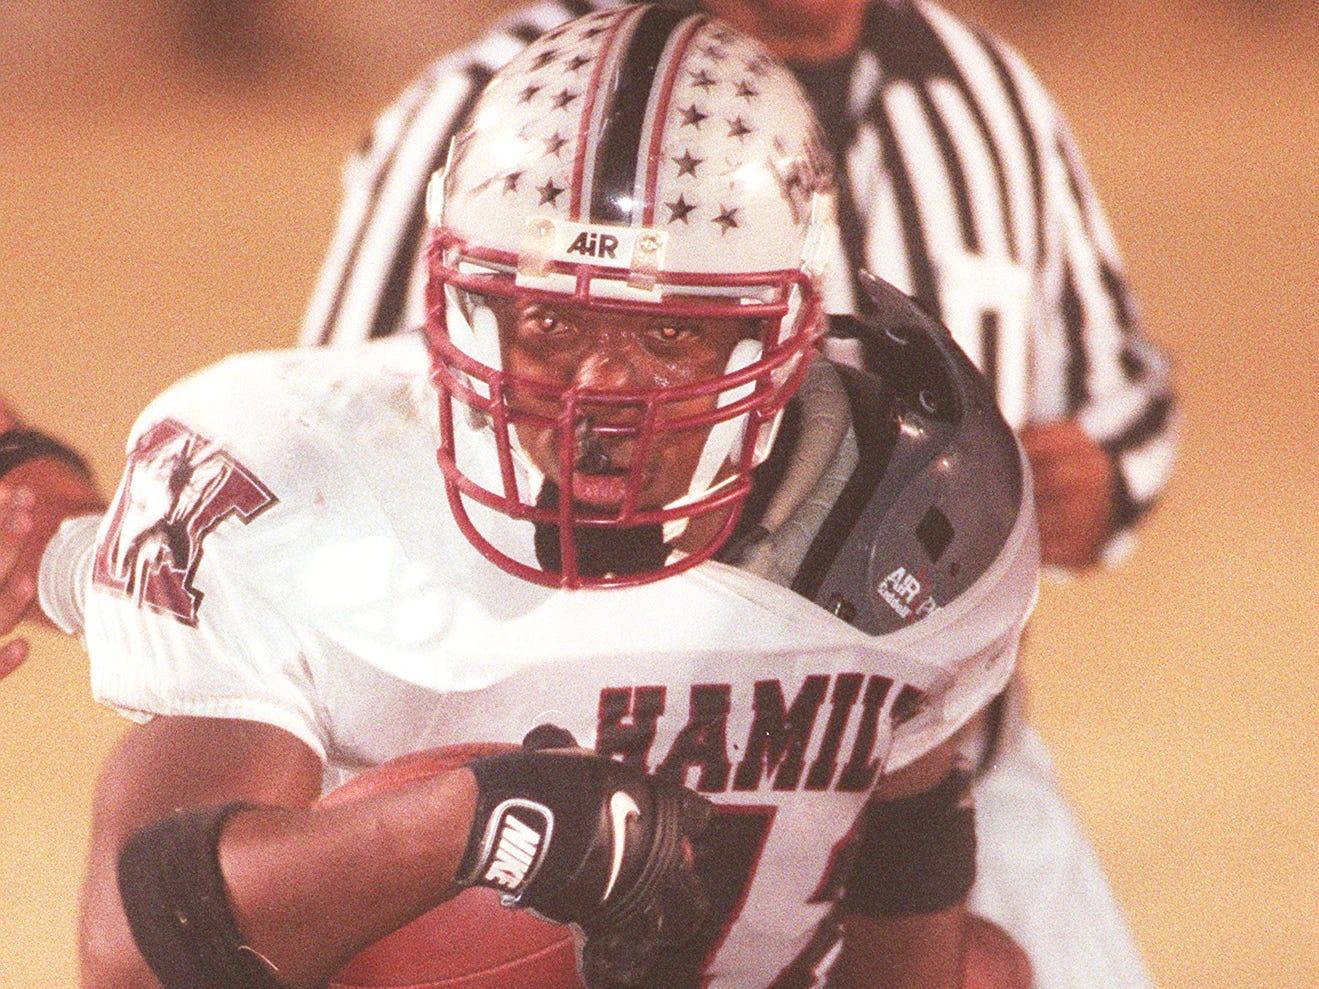 Hamilton High School's running back Terrell Suggs runs into the endzone to score Hamilton's first touchdown against Mountain View High School.